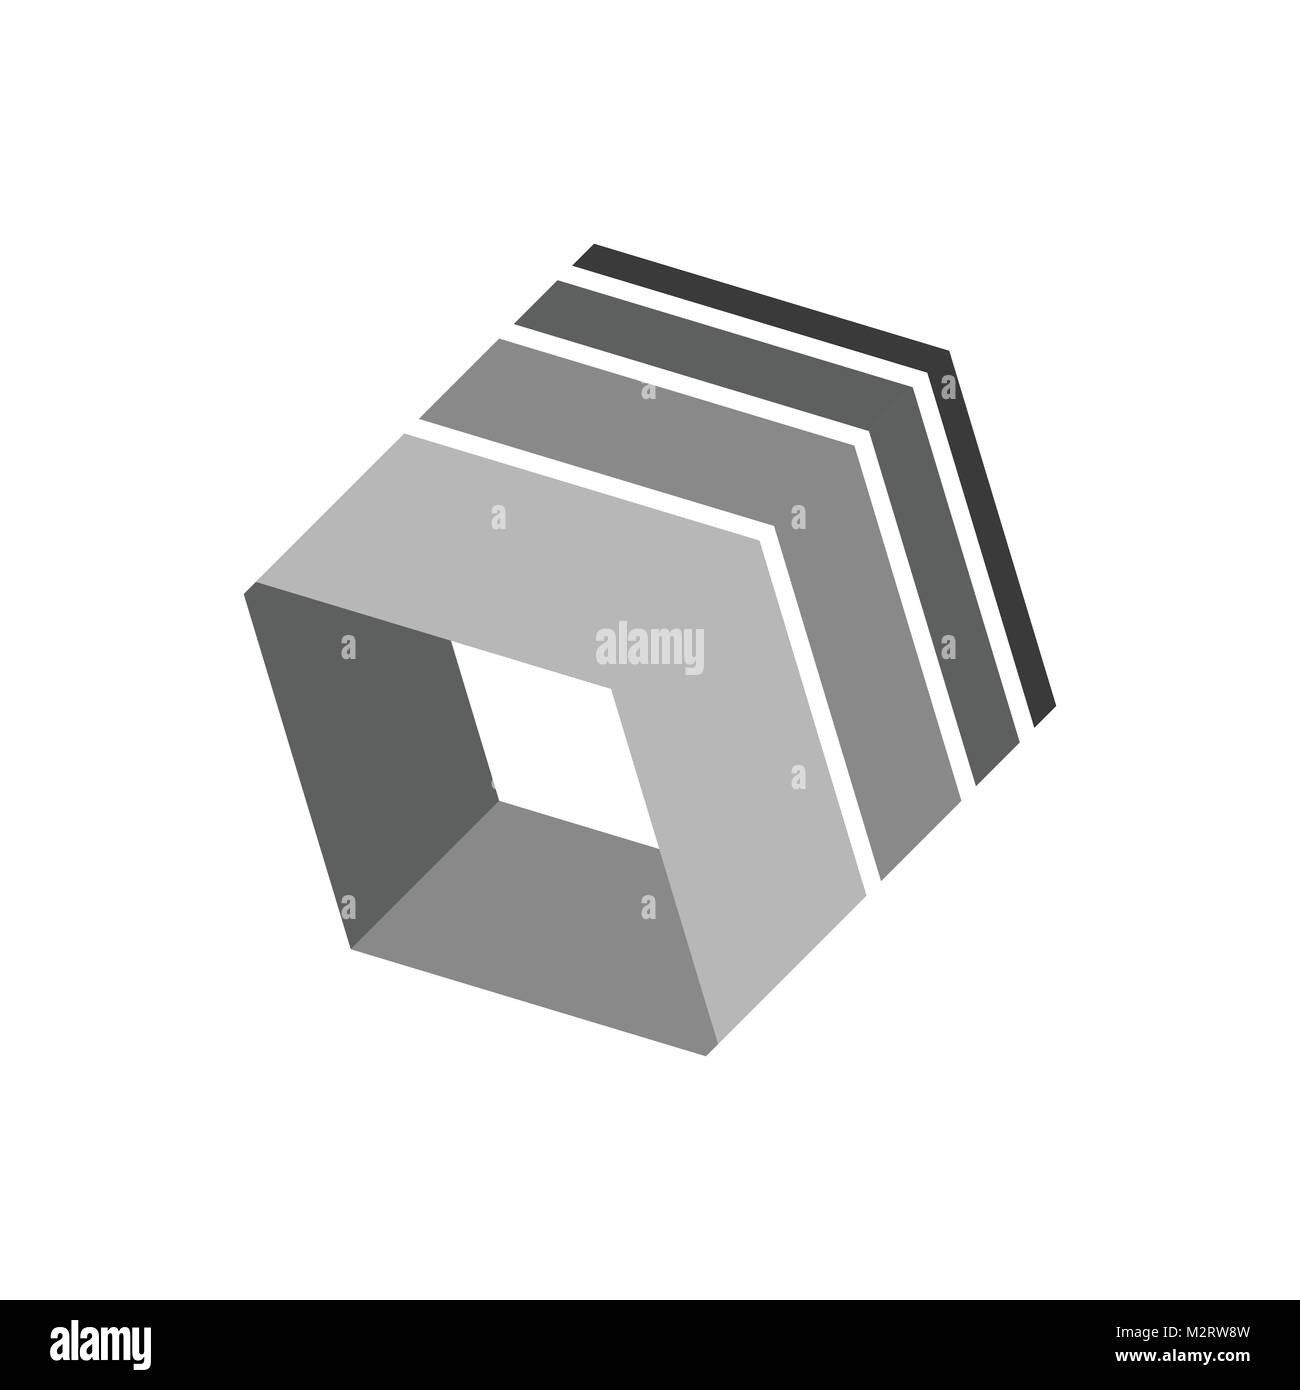 3 Dimensional Box Shape Abstract Corporate Symbol Vector Illustration Graphic Design - Stock Vector